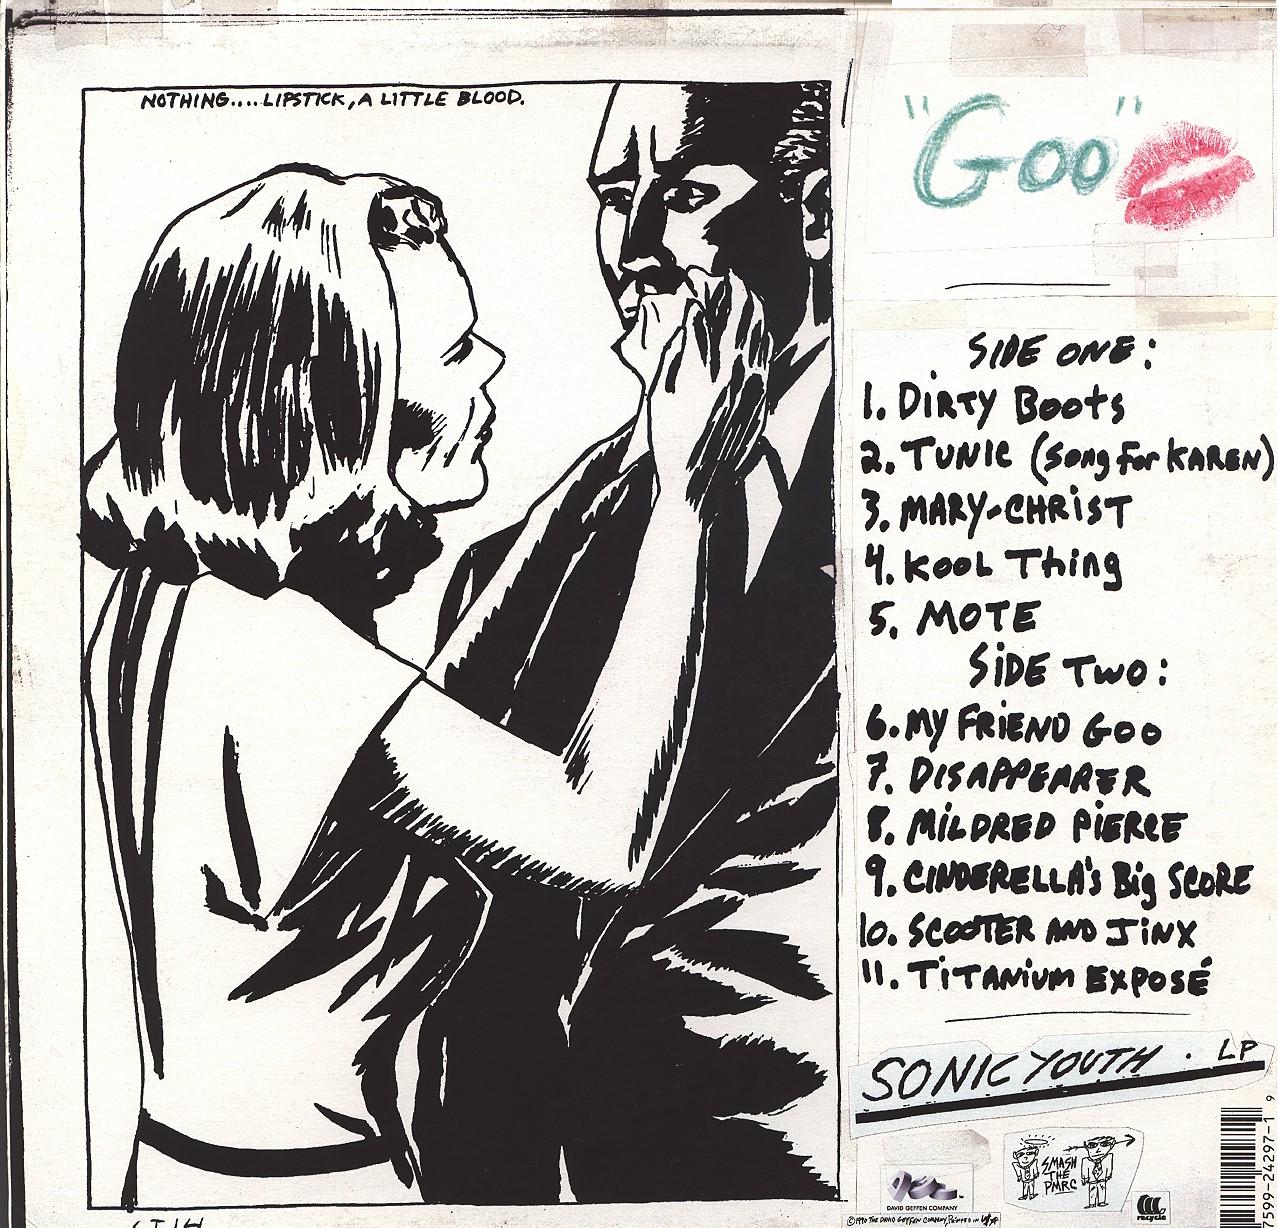 Sonic Youth album art (Pettibon)